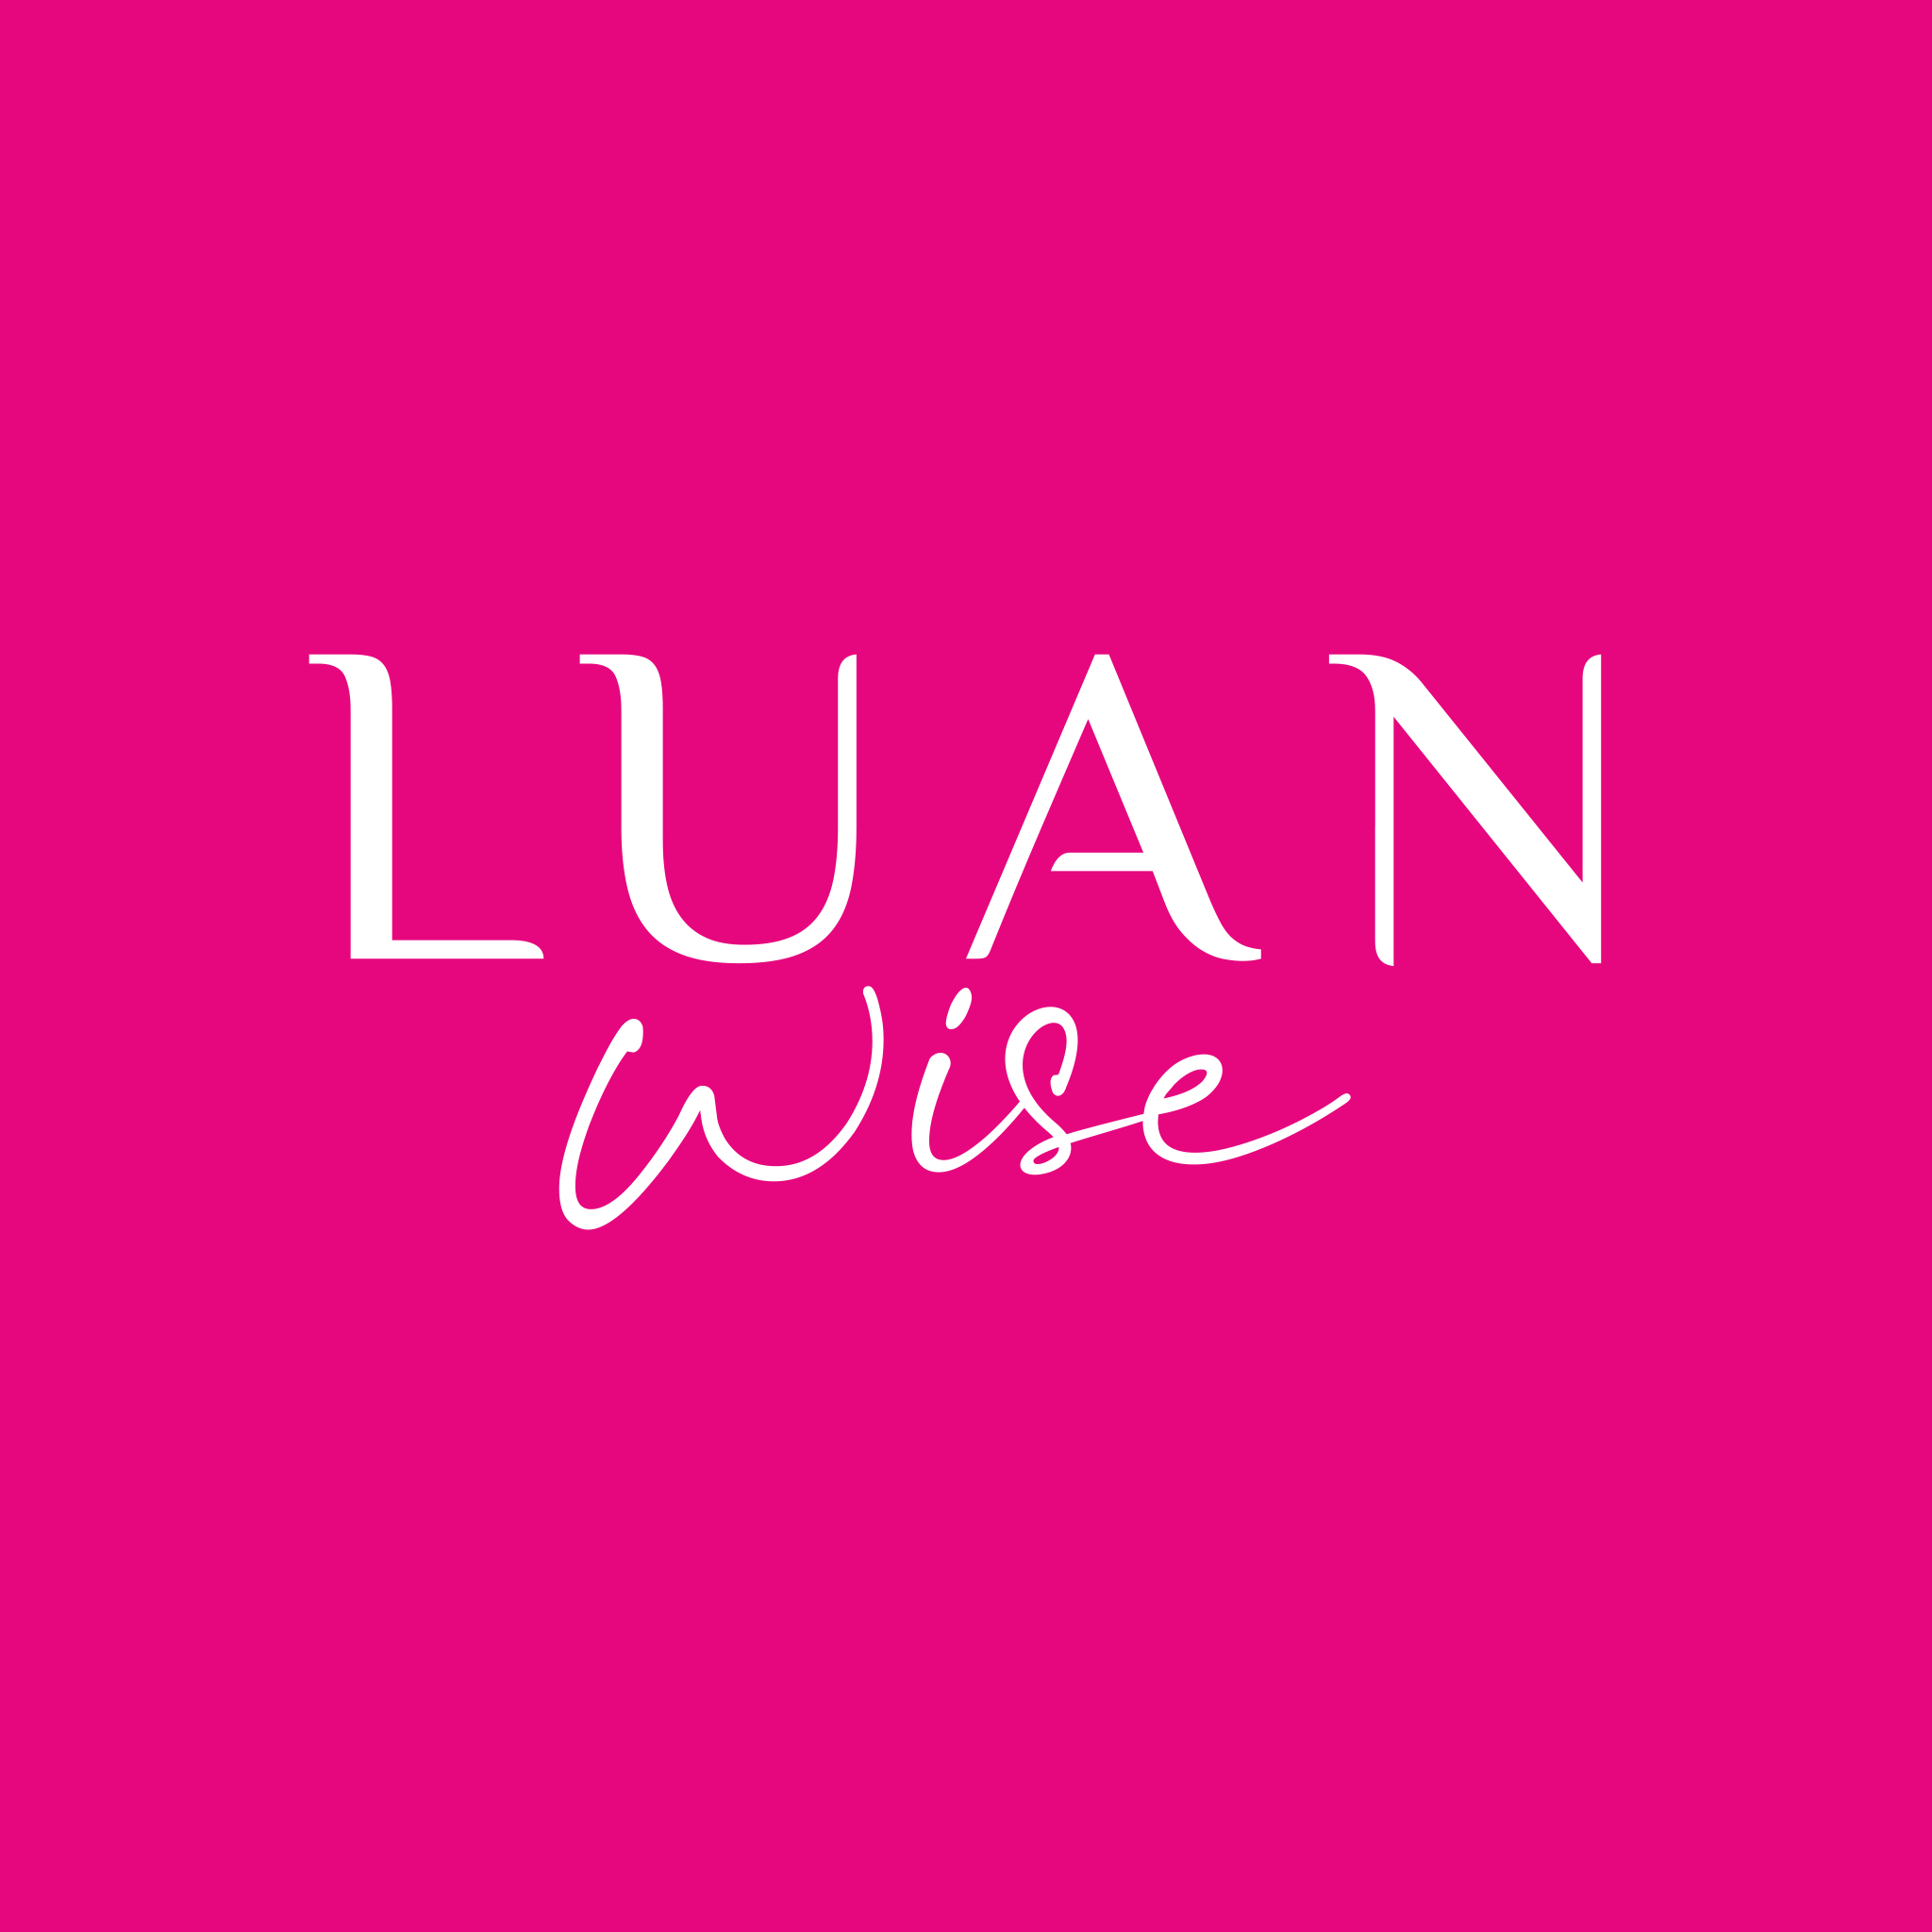 Luan Wise